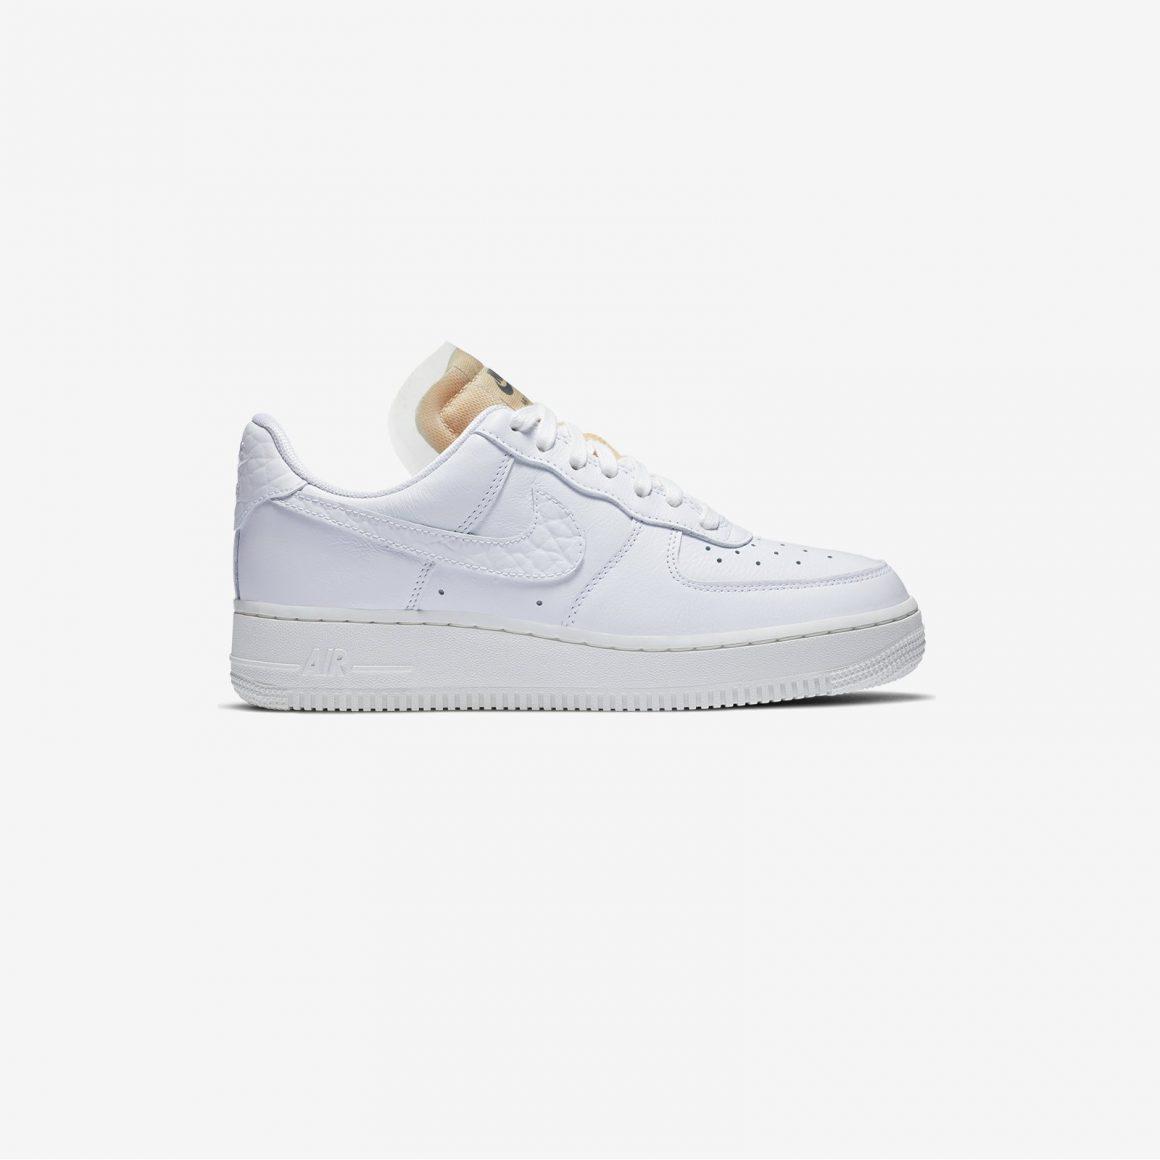 Nike WMNS Air Force 1 '07 LX ''Bling'' - ''White Onyx'' - CZ8101-100